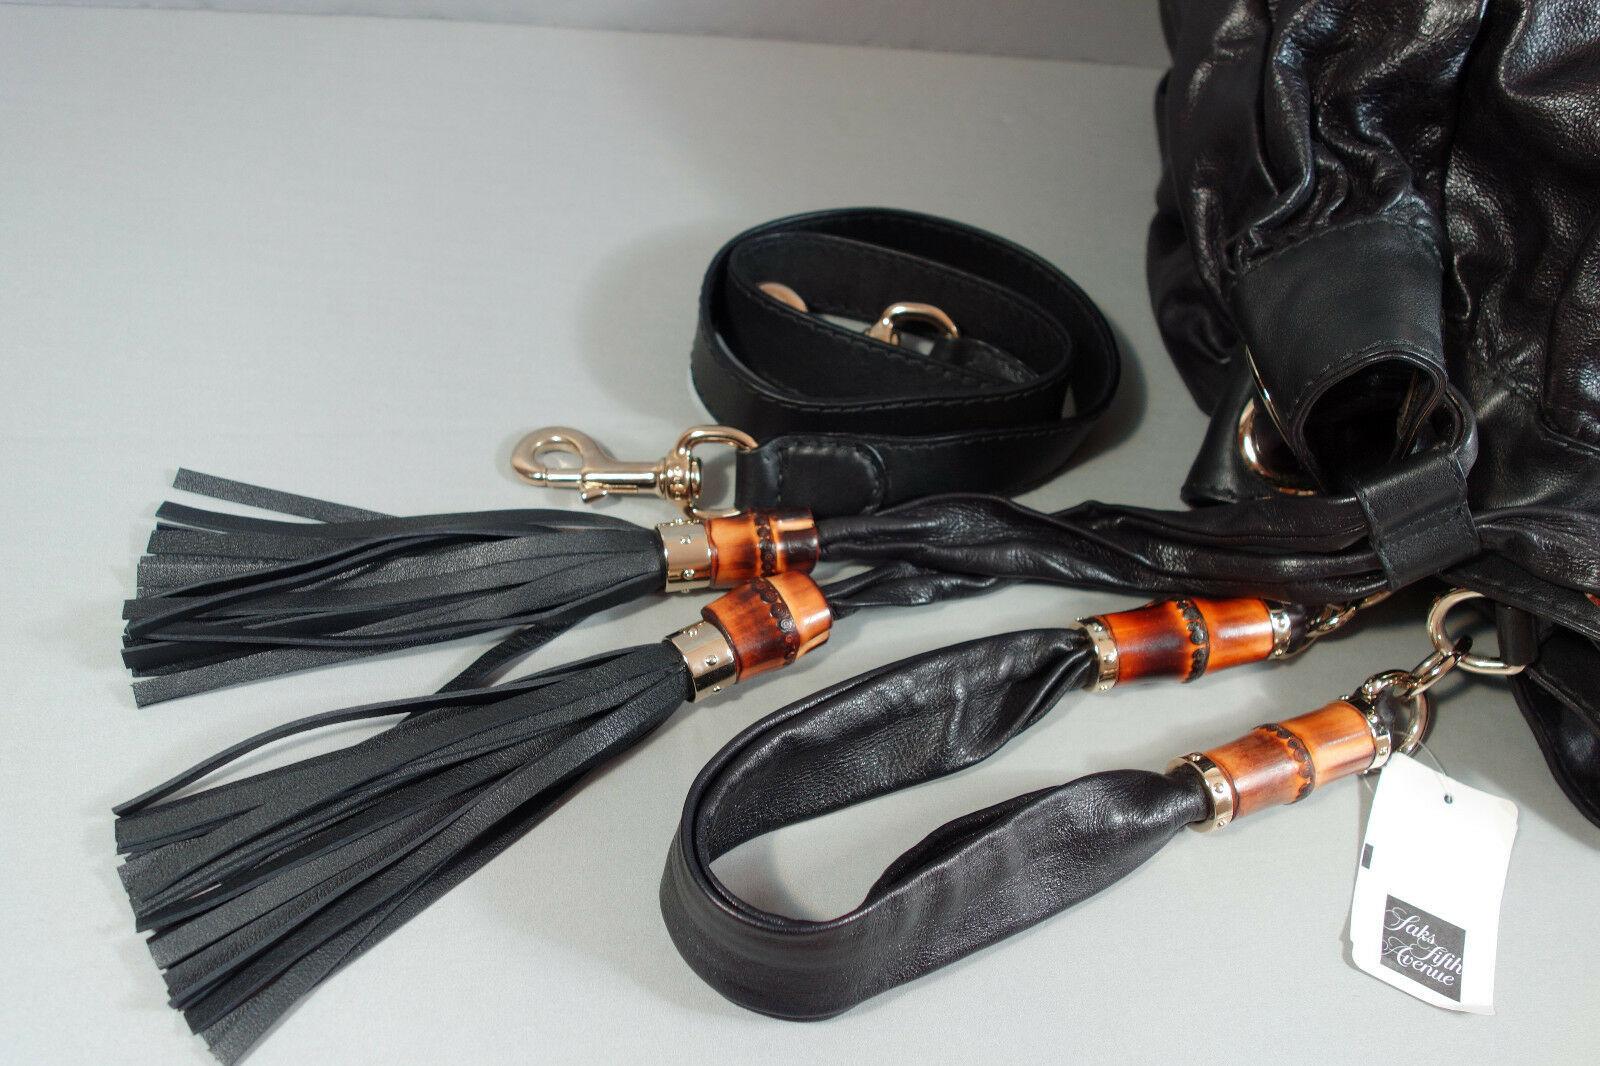 GUCCI Black Leather NEW Shoulder Bucket Bag XL Bamboo Tassels Hobo Tote Handbag